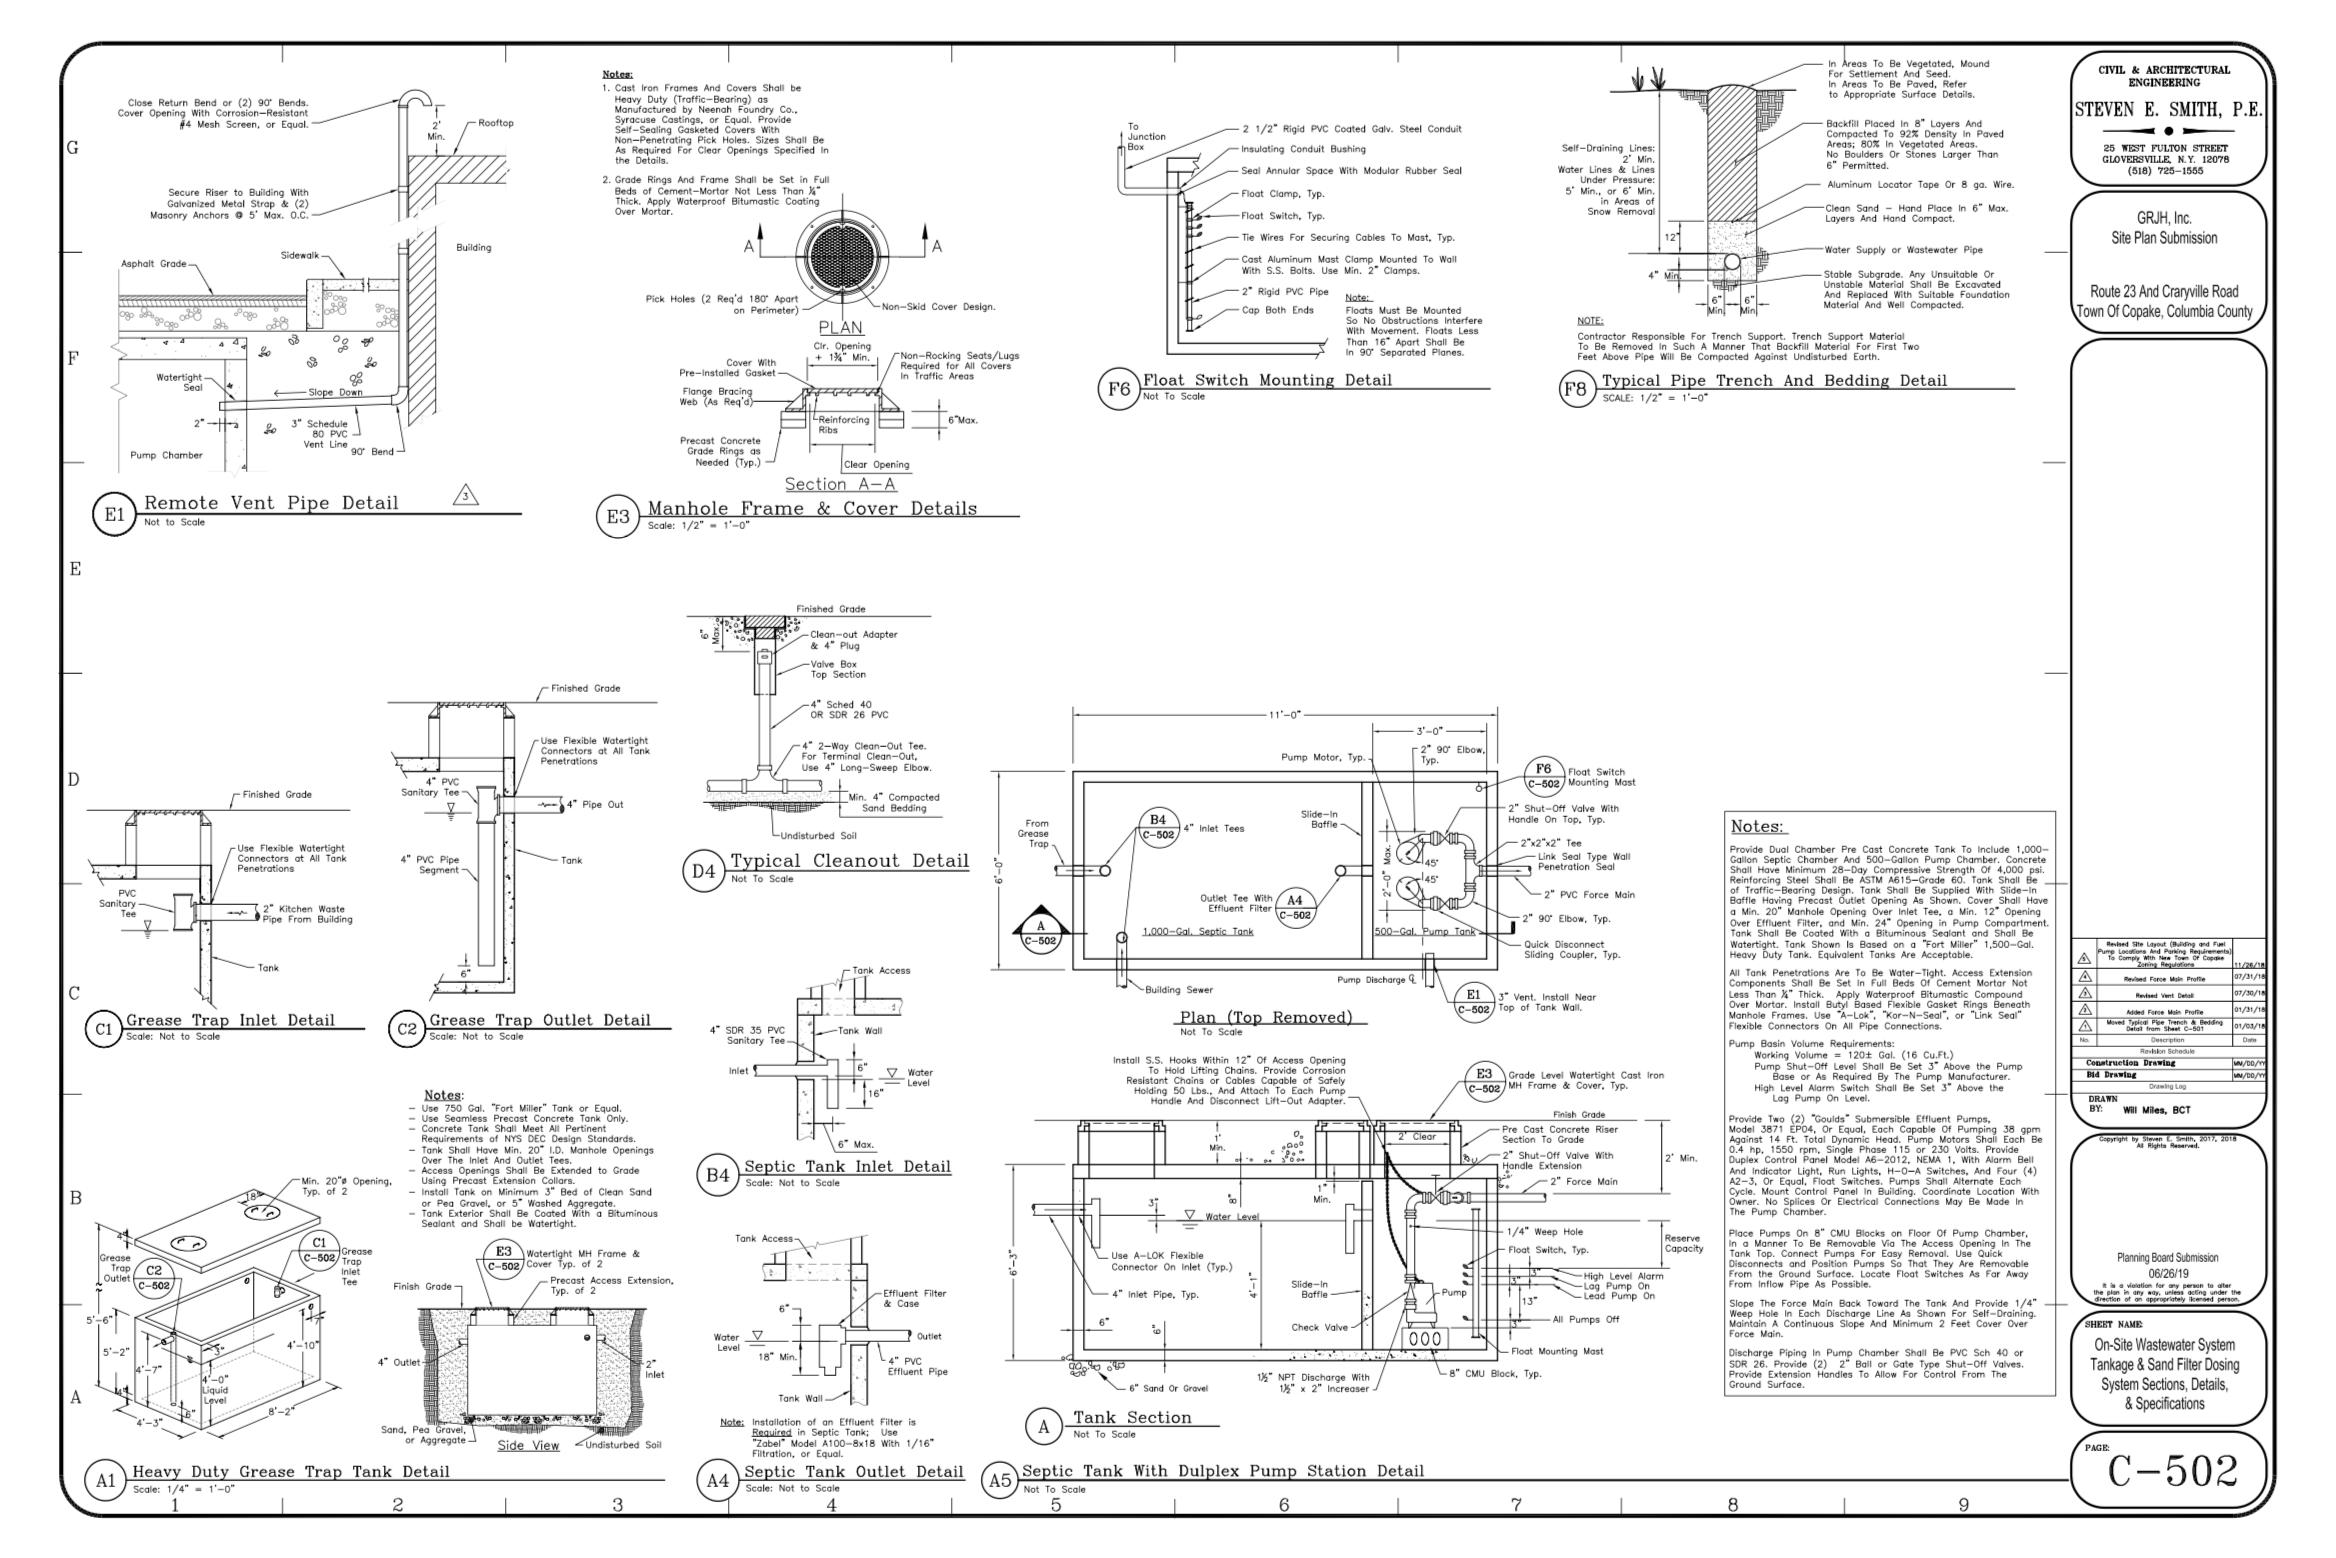 Site Plans GRJH Cobble Pond Gas Station_09.jpg